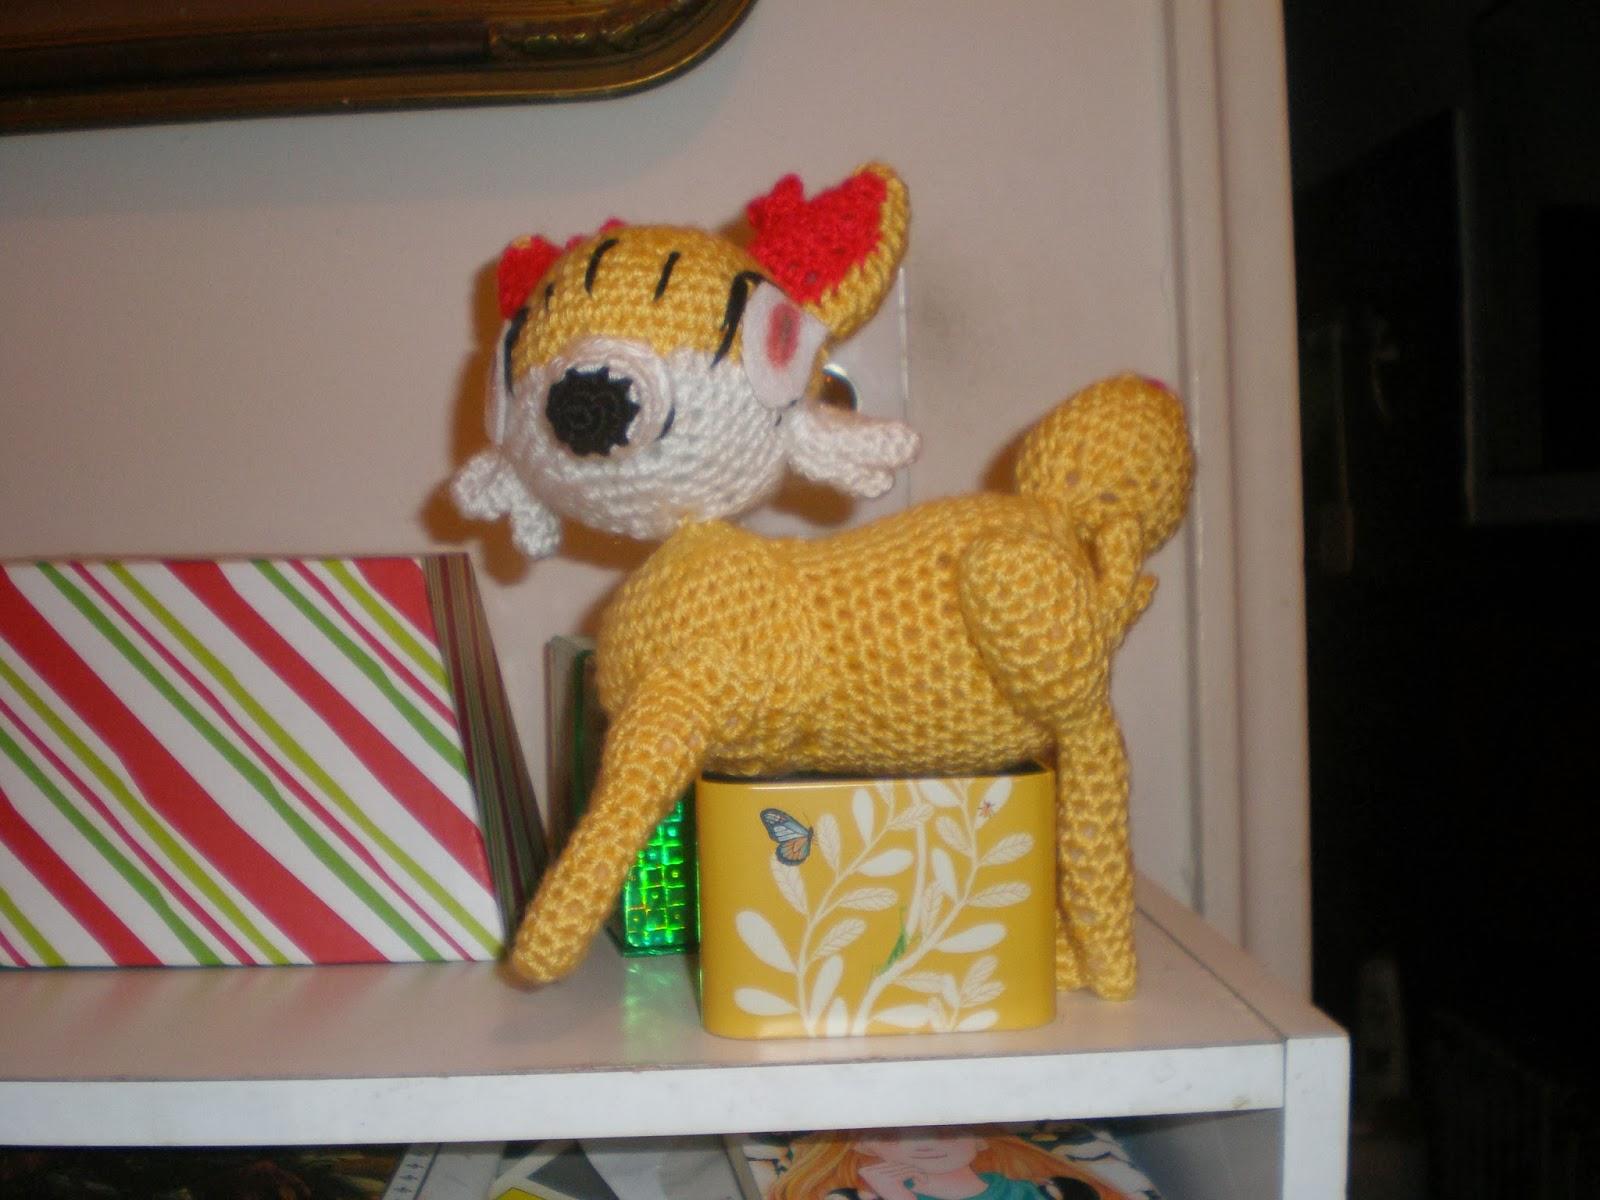 40 Crochet Pokémon Patterns - Gotta Crochet Them All | Crochet News | 1200x1600